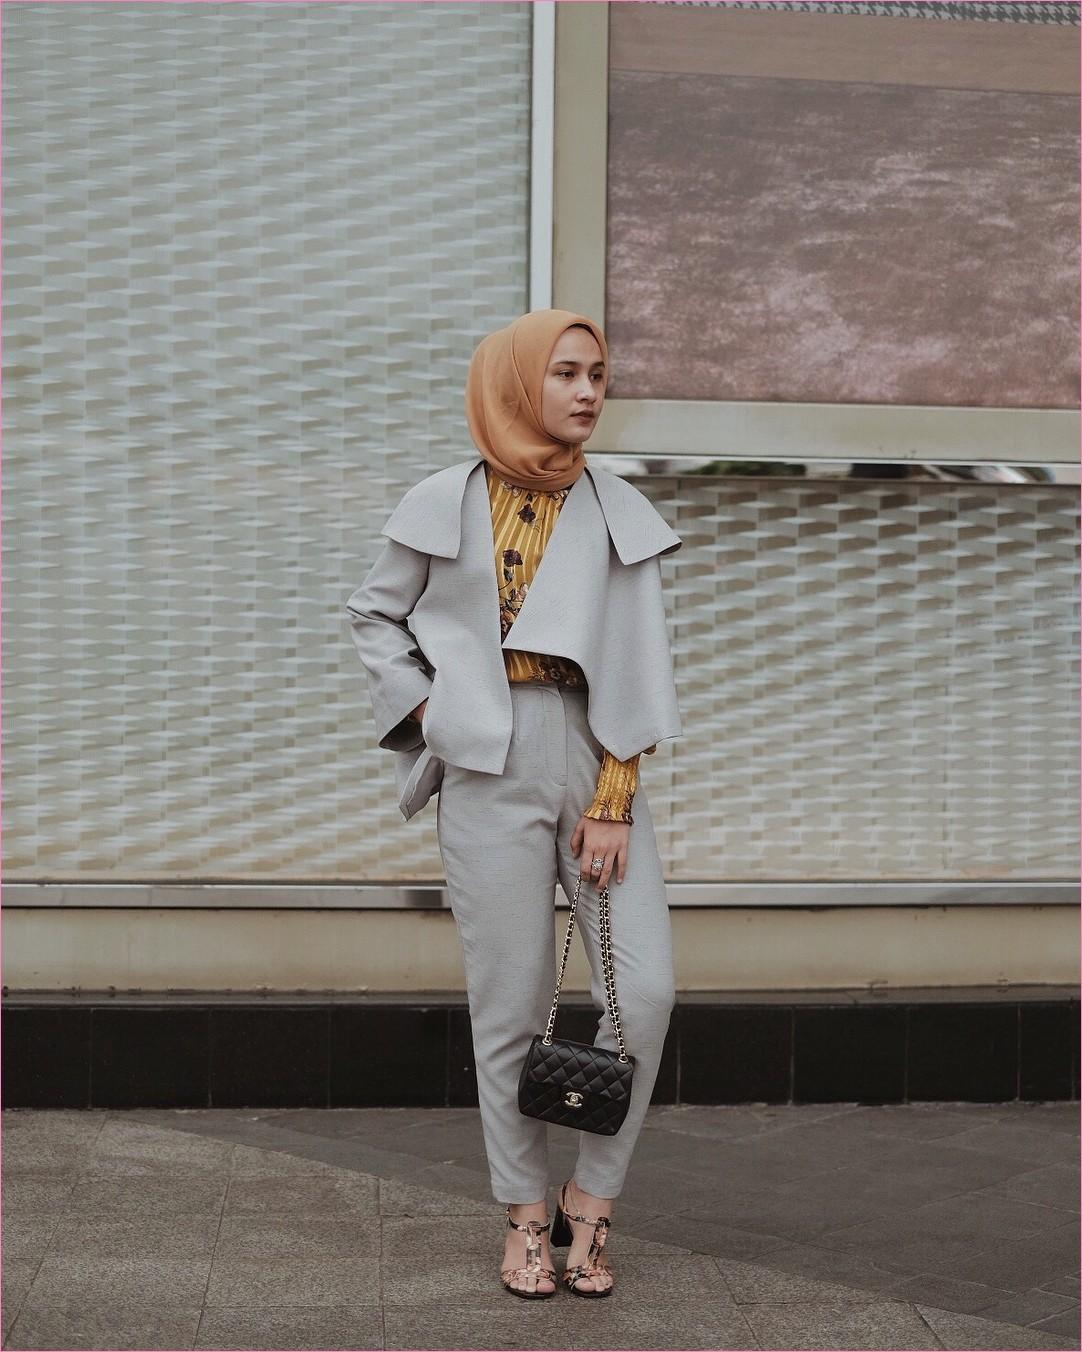 Outfit Baju Hijab Casual Untuk Ke Kantor Ala Selebgam 2018 longpants celana bahan blazer abu tua kemeja bunga kuning square hijab oren muda ciput rajut cincin slingbags hitam channel loafers and slip ons high heels coklat tua gaya casual kain sutra rayon ootd 2018 selebgram lukisan